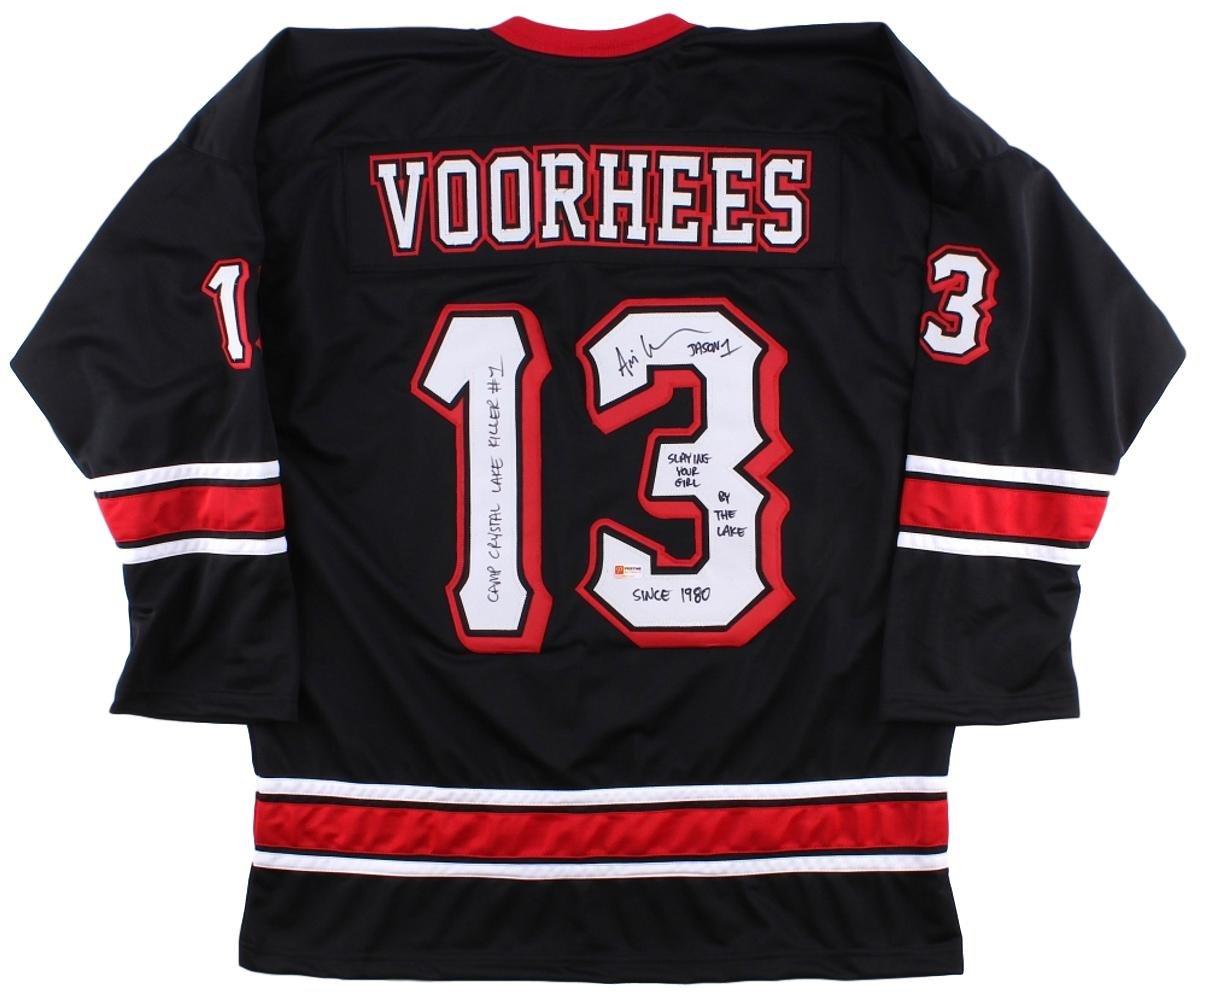 Ari Lehman Signed Custom Jason Vorhees Hockey Jersey 3 Inscriptions...